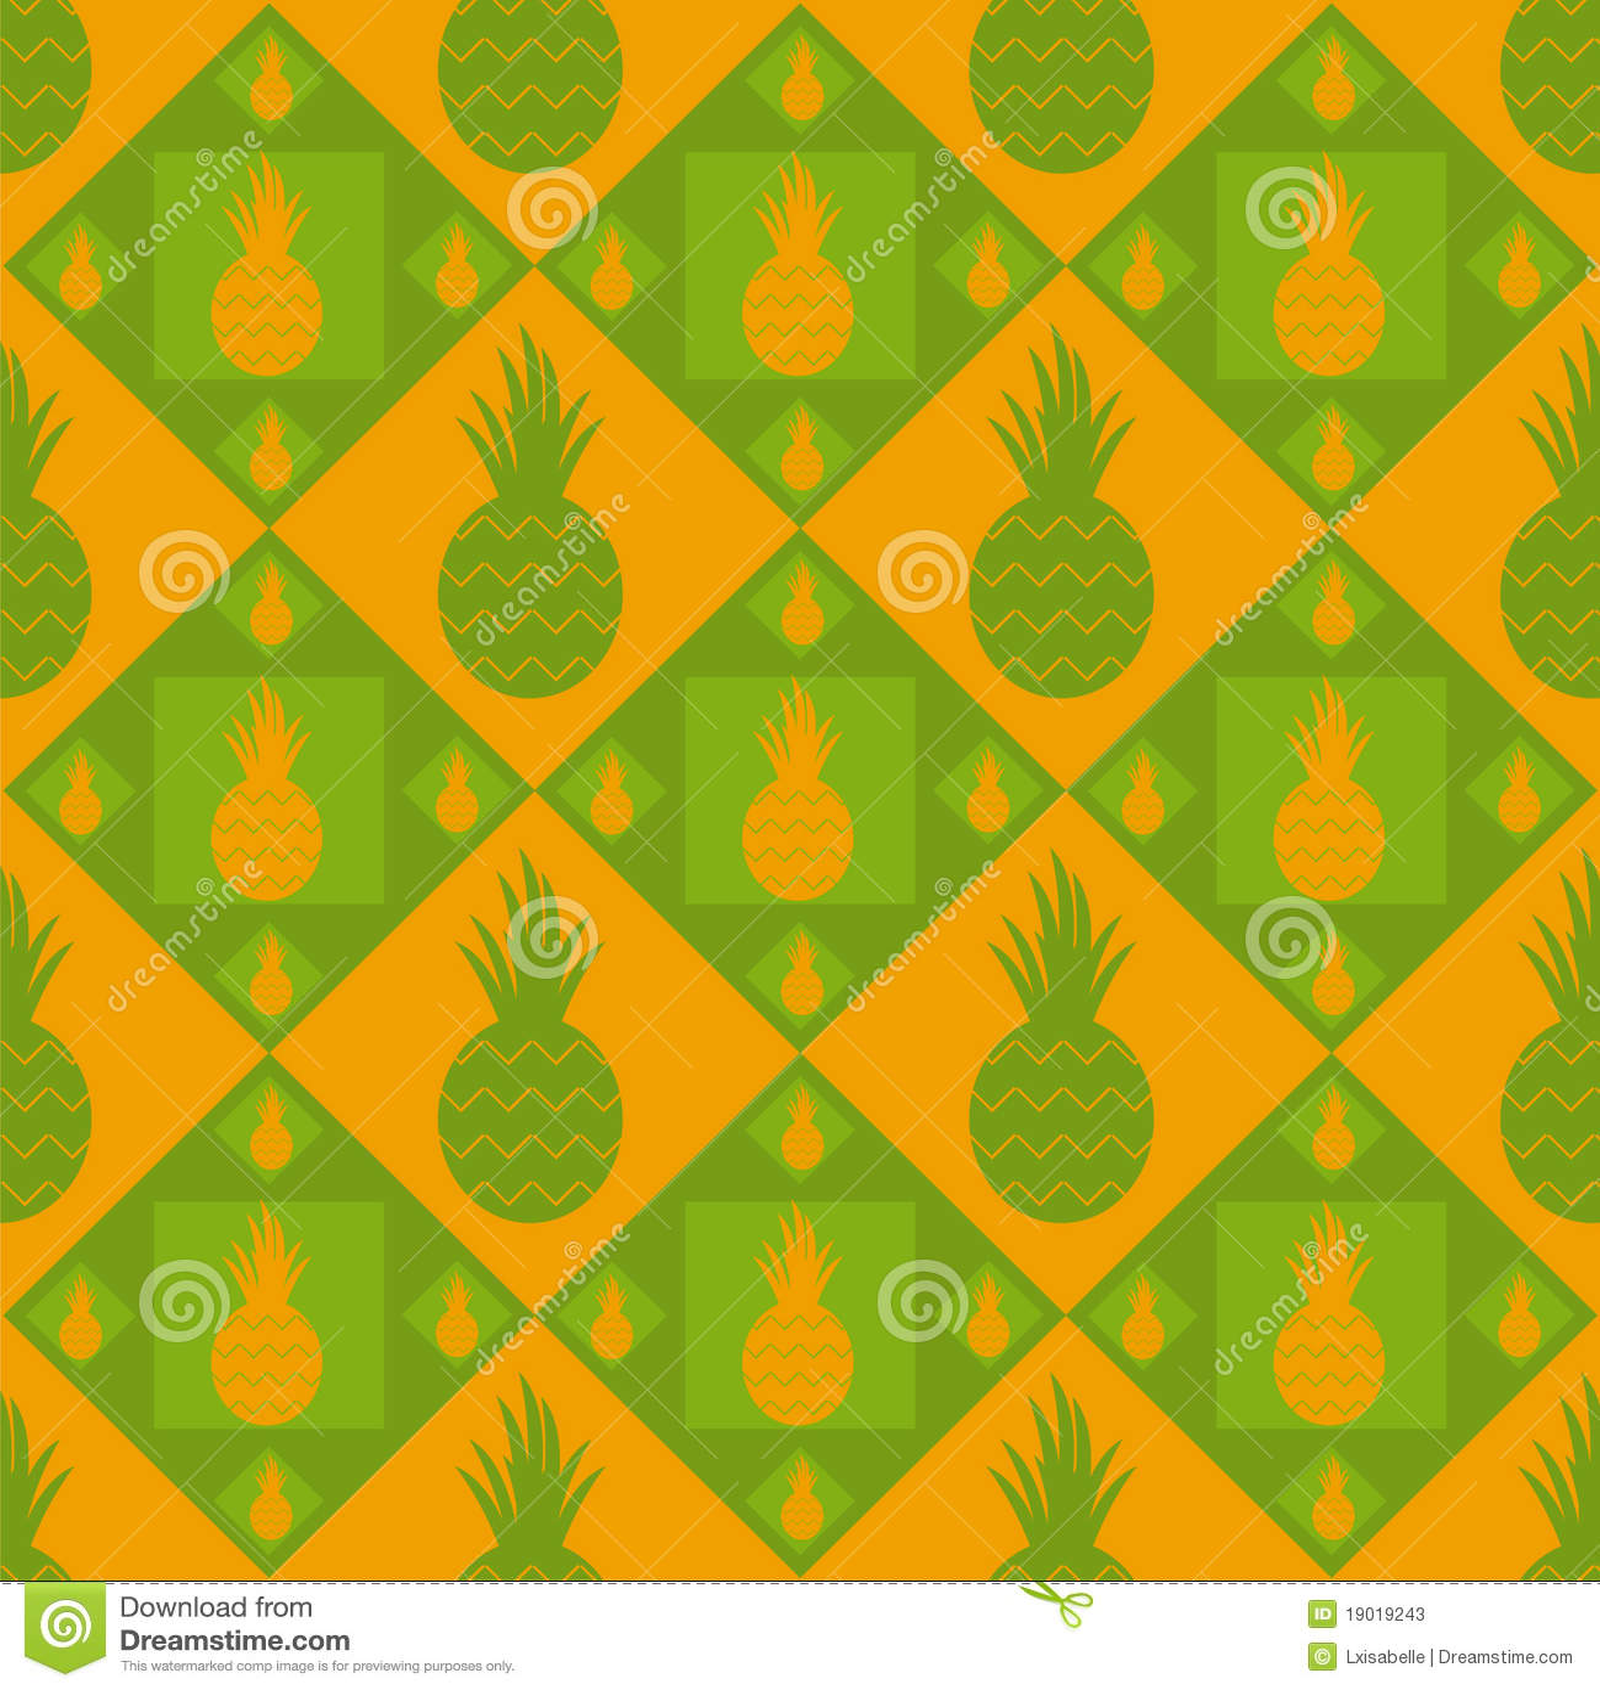 Cute Cartoon Fruit Wallpaper Cute Pineapple Pattern Stock Vector Illustration Of